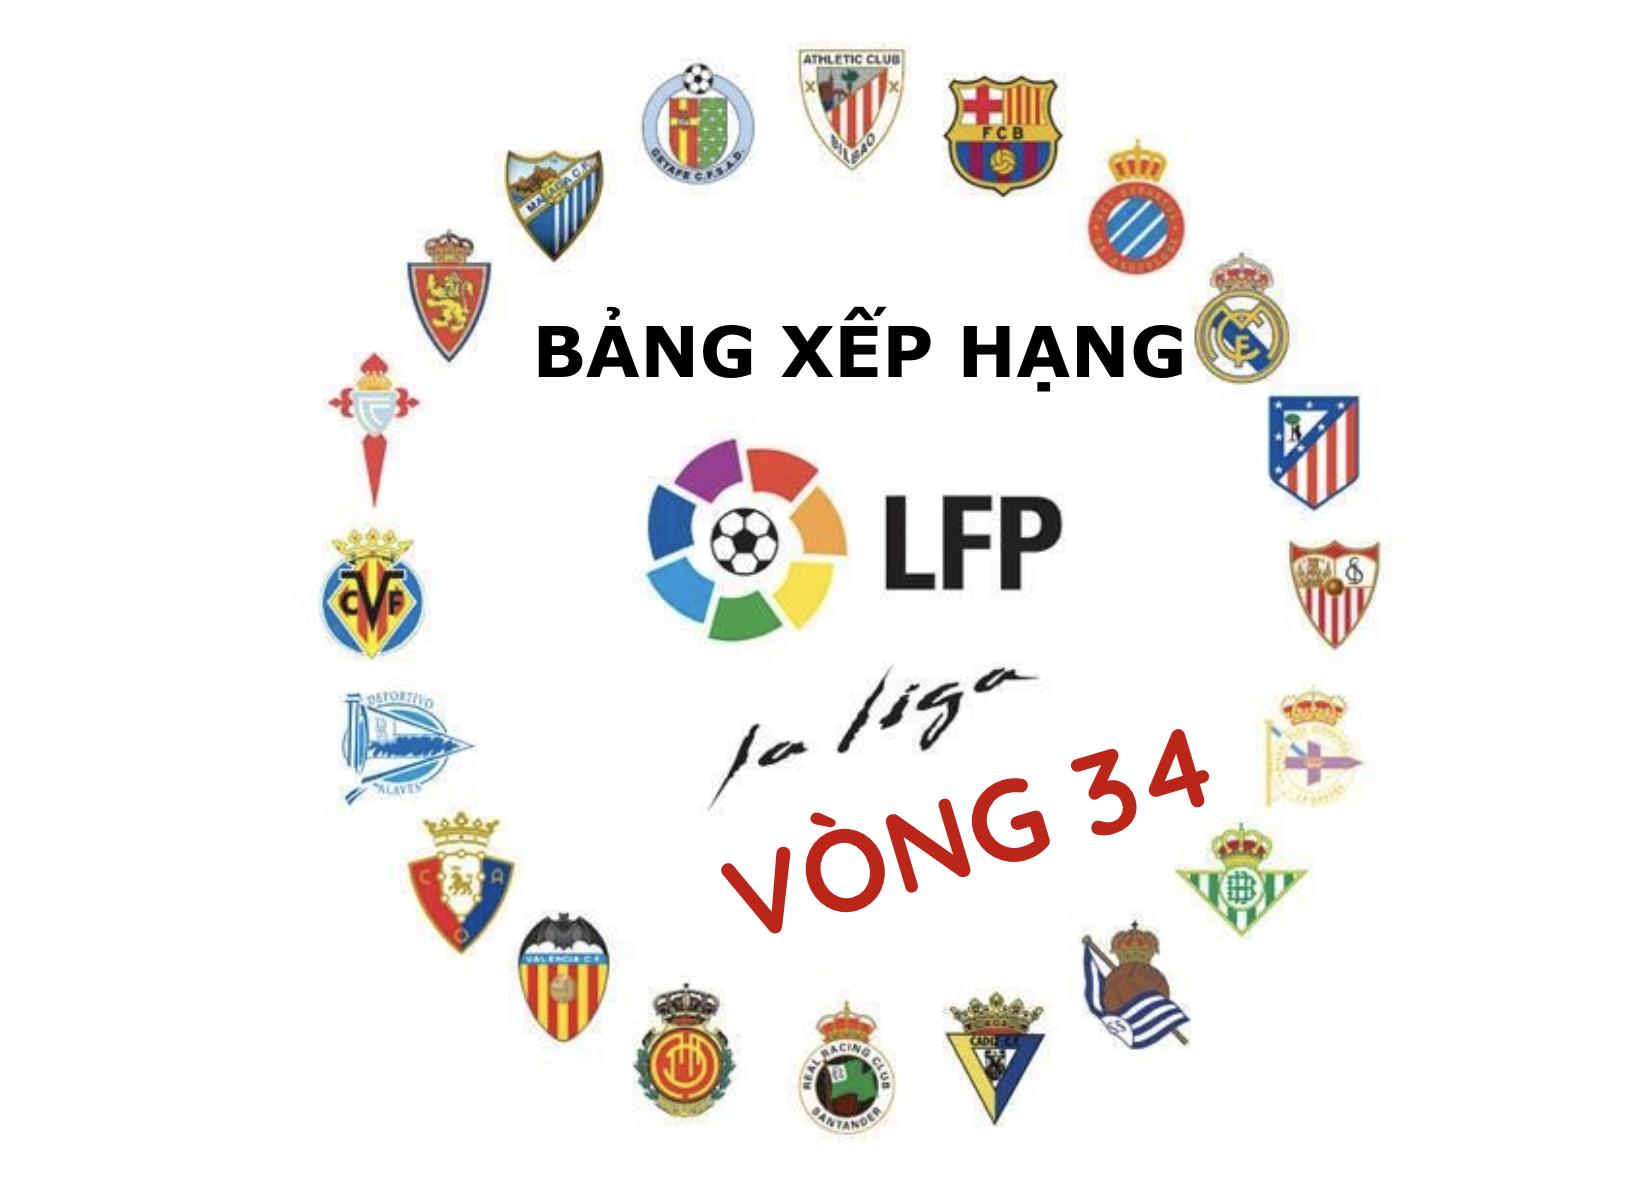 Bảng Xếp Hạng La Liga 2020/21 Sau Vòng 34